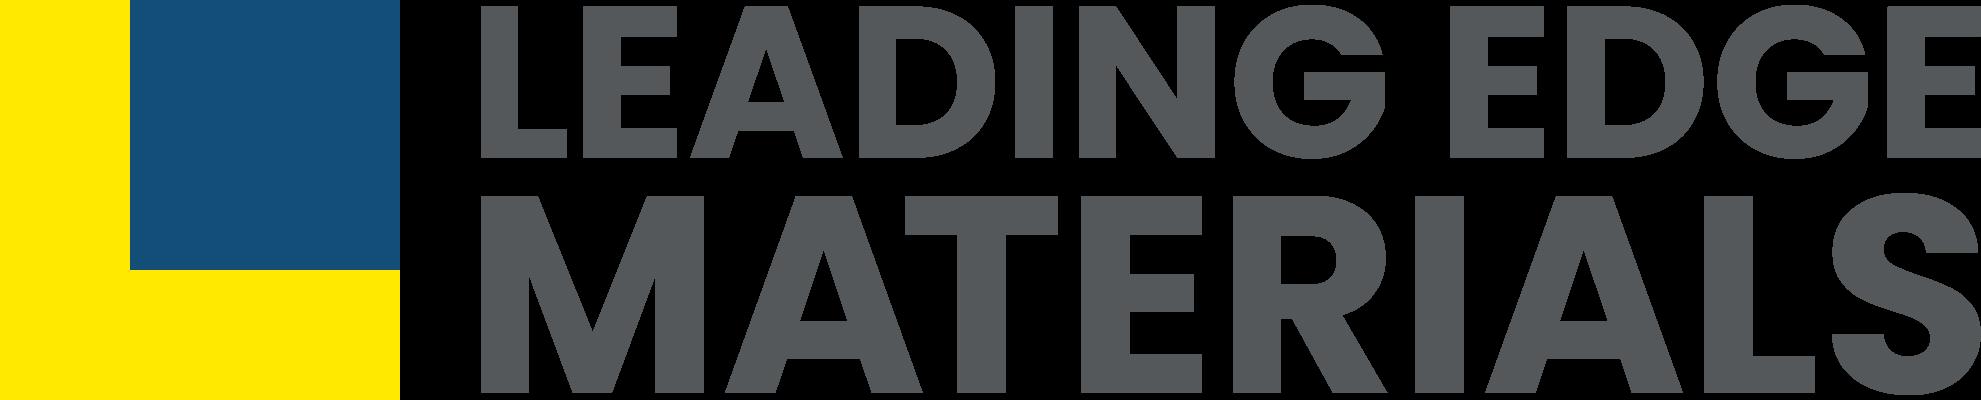 Leading Edge Materials Corp.